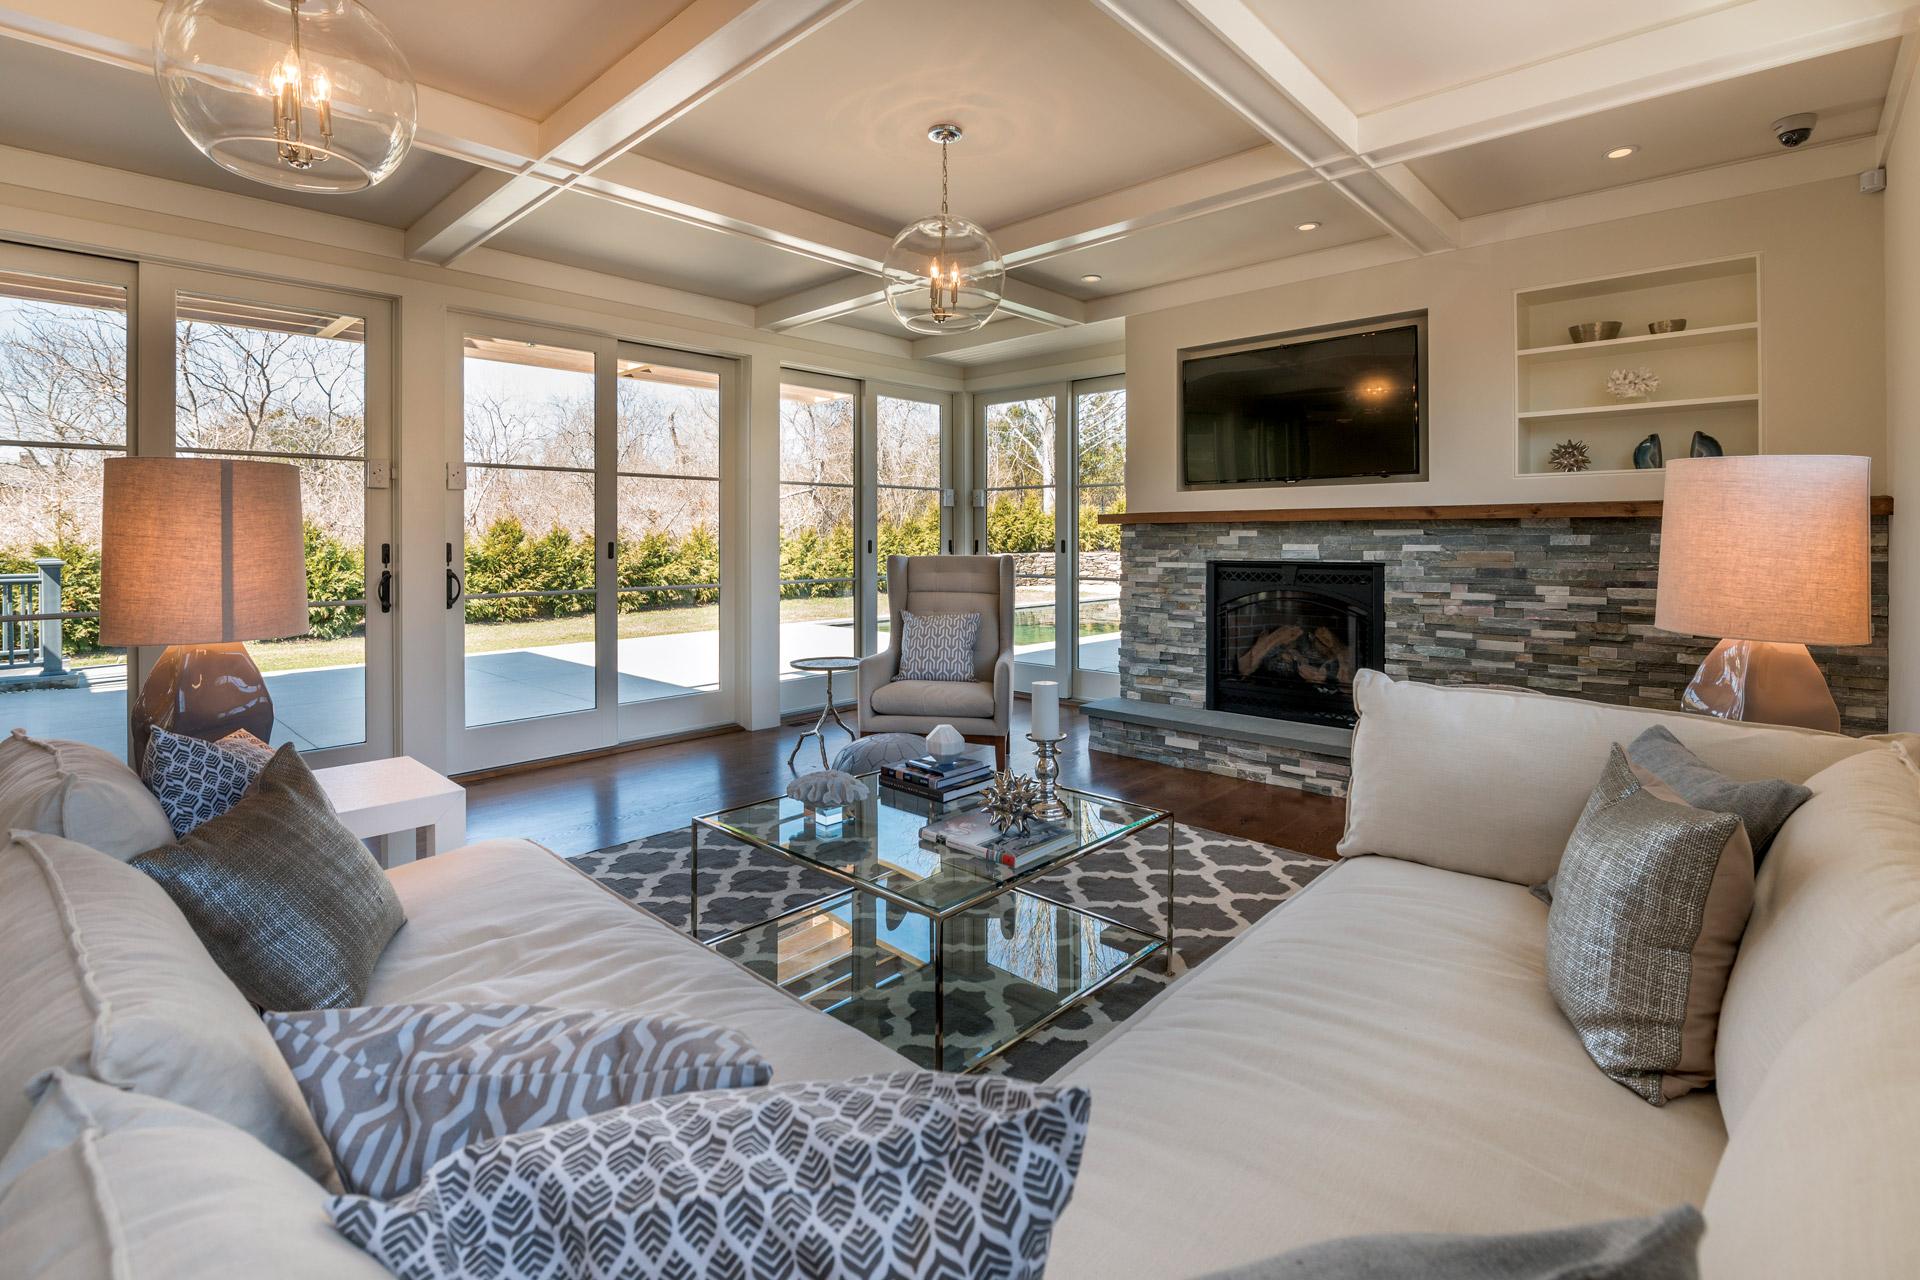 Art Village Residence home for sale